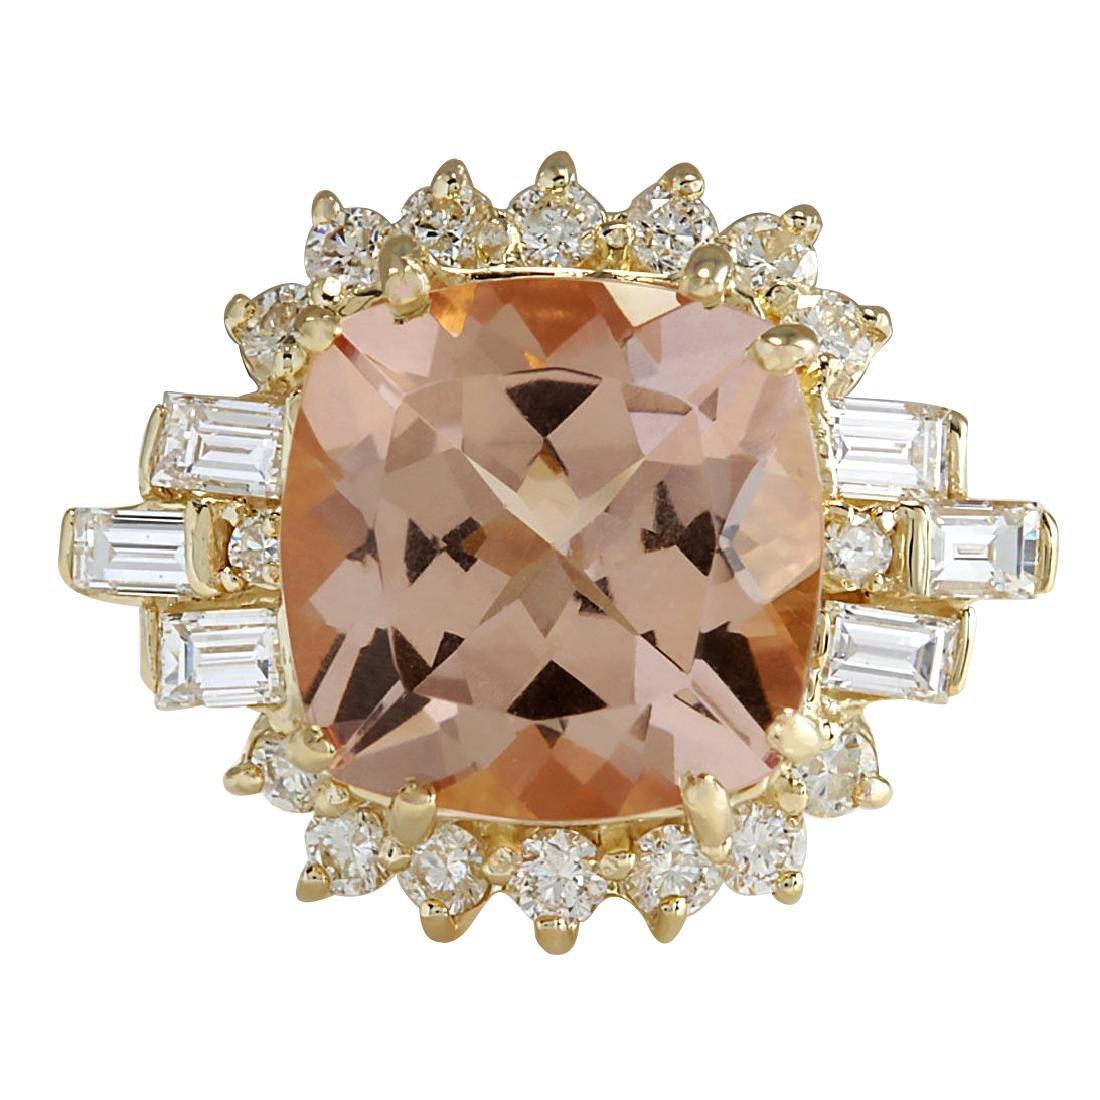 7.23CTW Natural Morganite And Diamond Ring 18K Solid